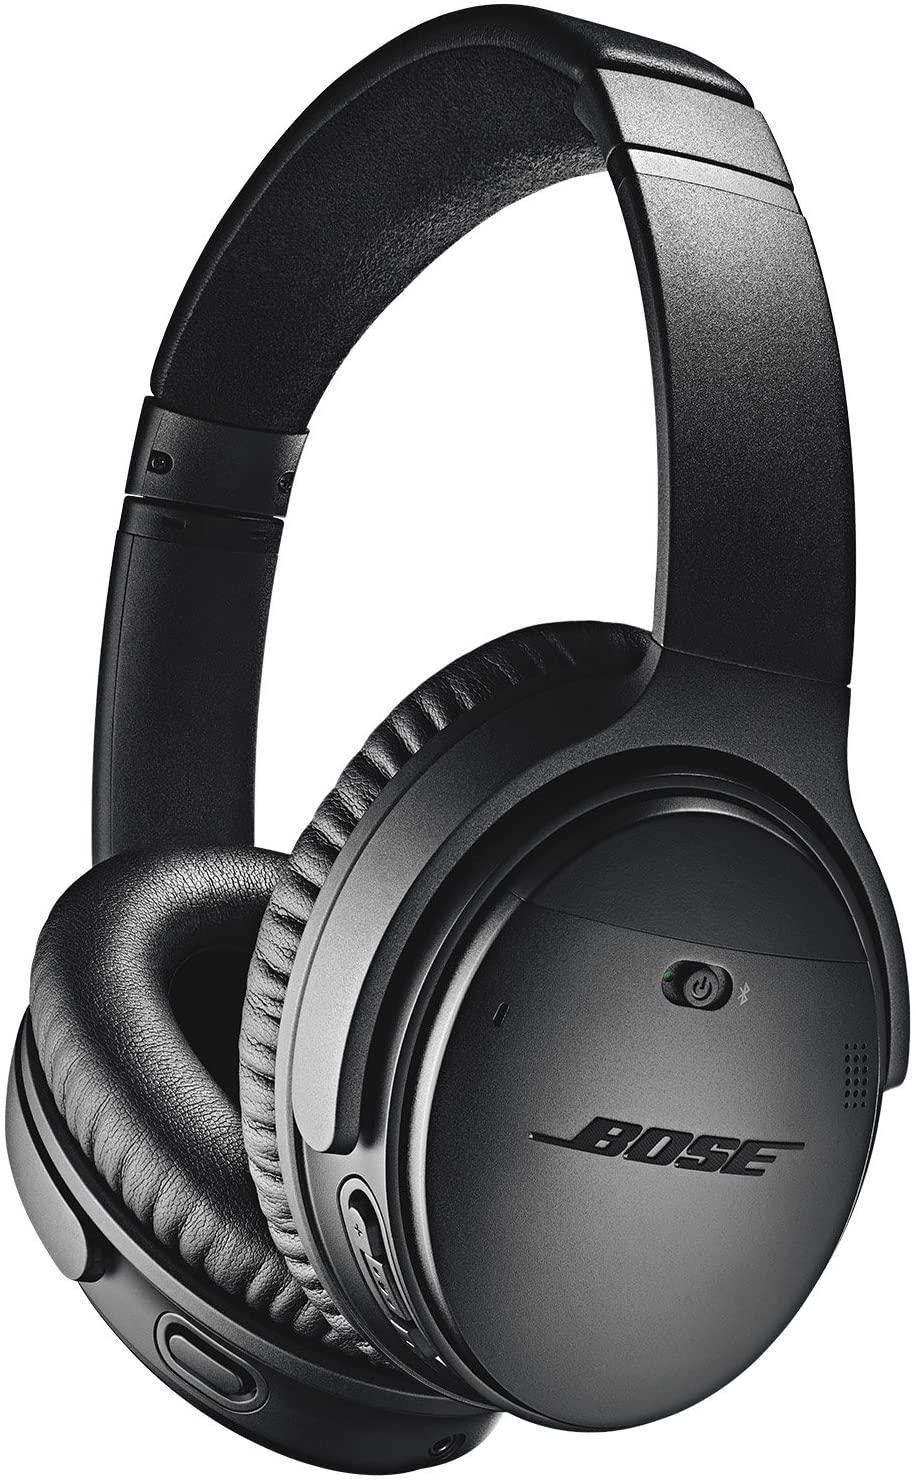 Save $50 on Bose QuietComfort 35 II Wireless Bluetooth Headphones